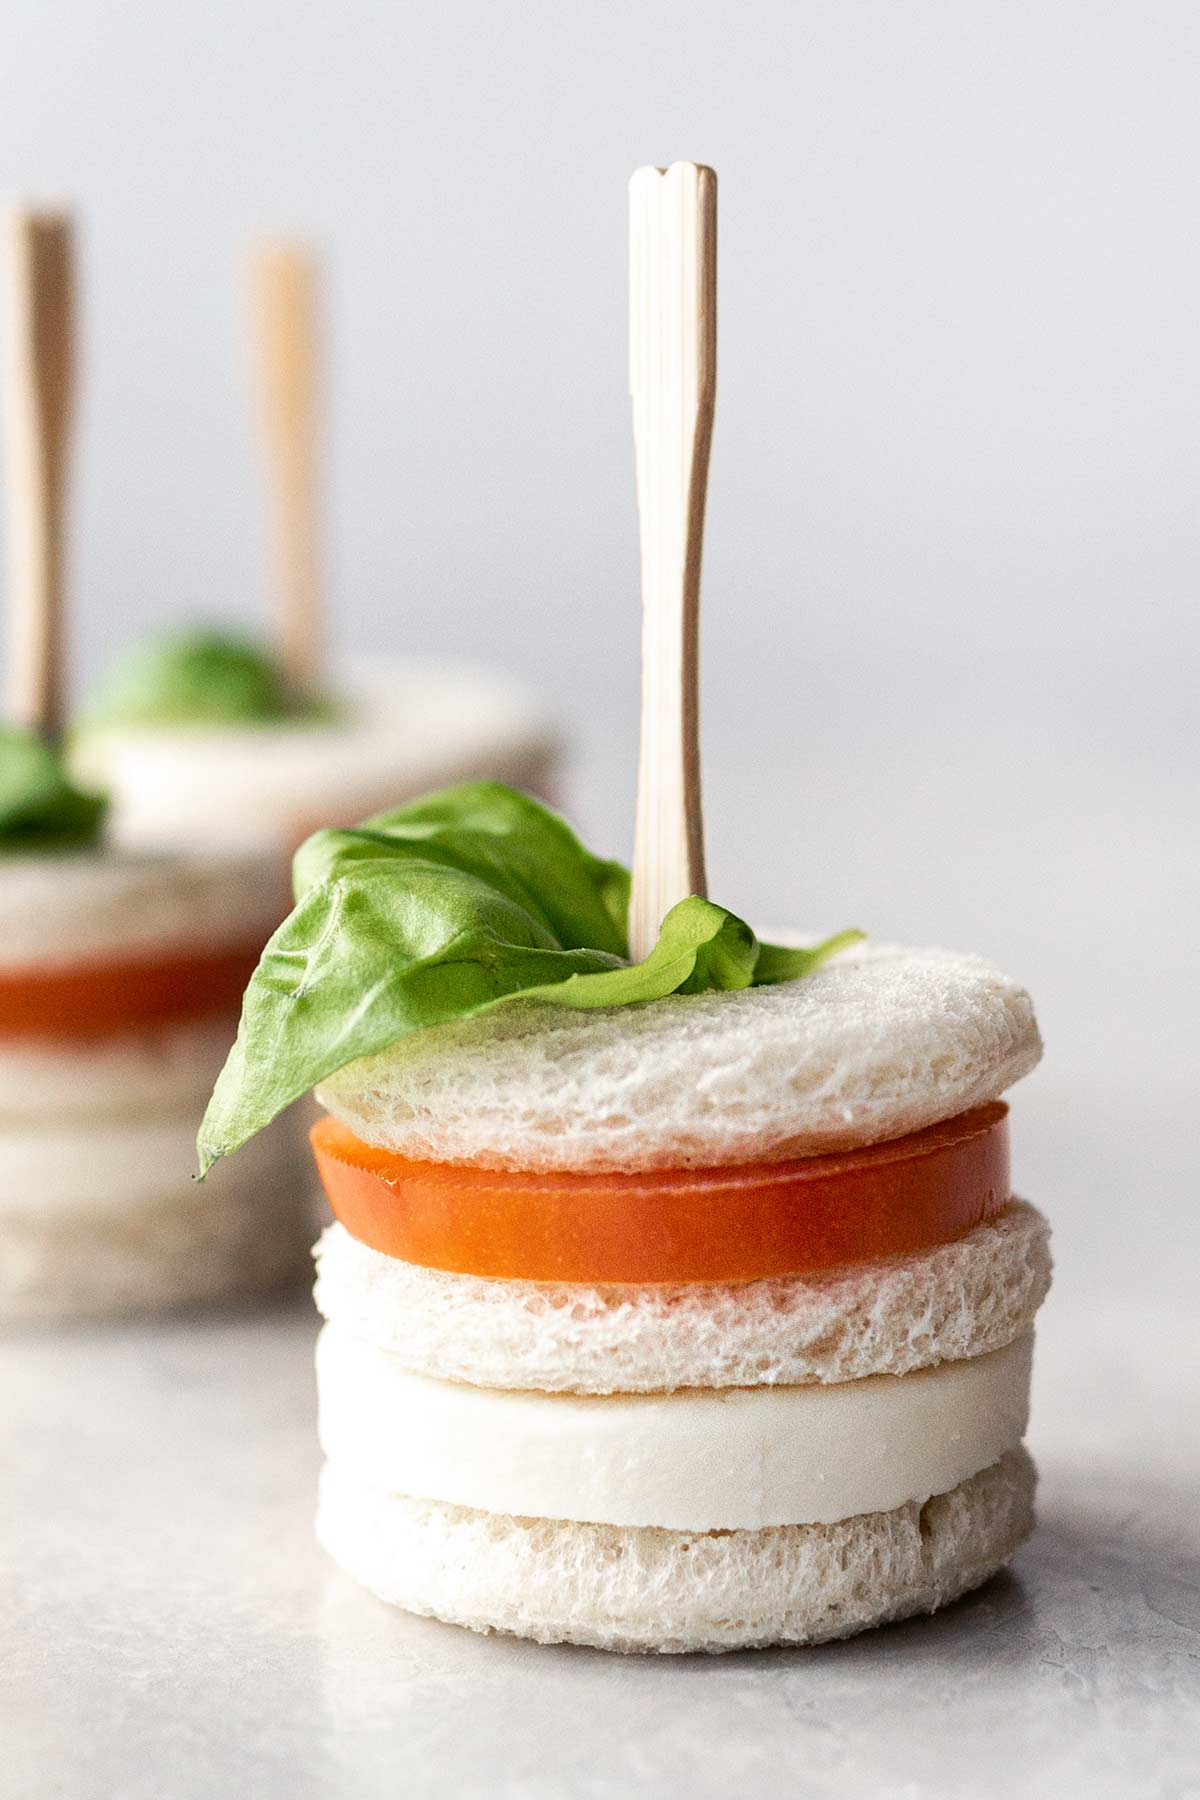 Mozzarella and tomato tea sandwiches with cocktail forks.